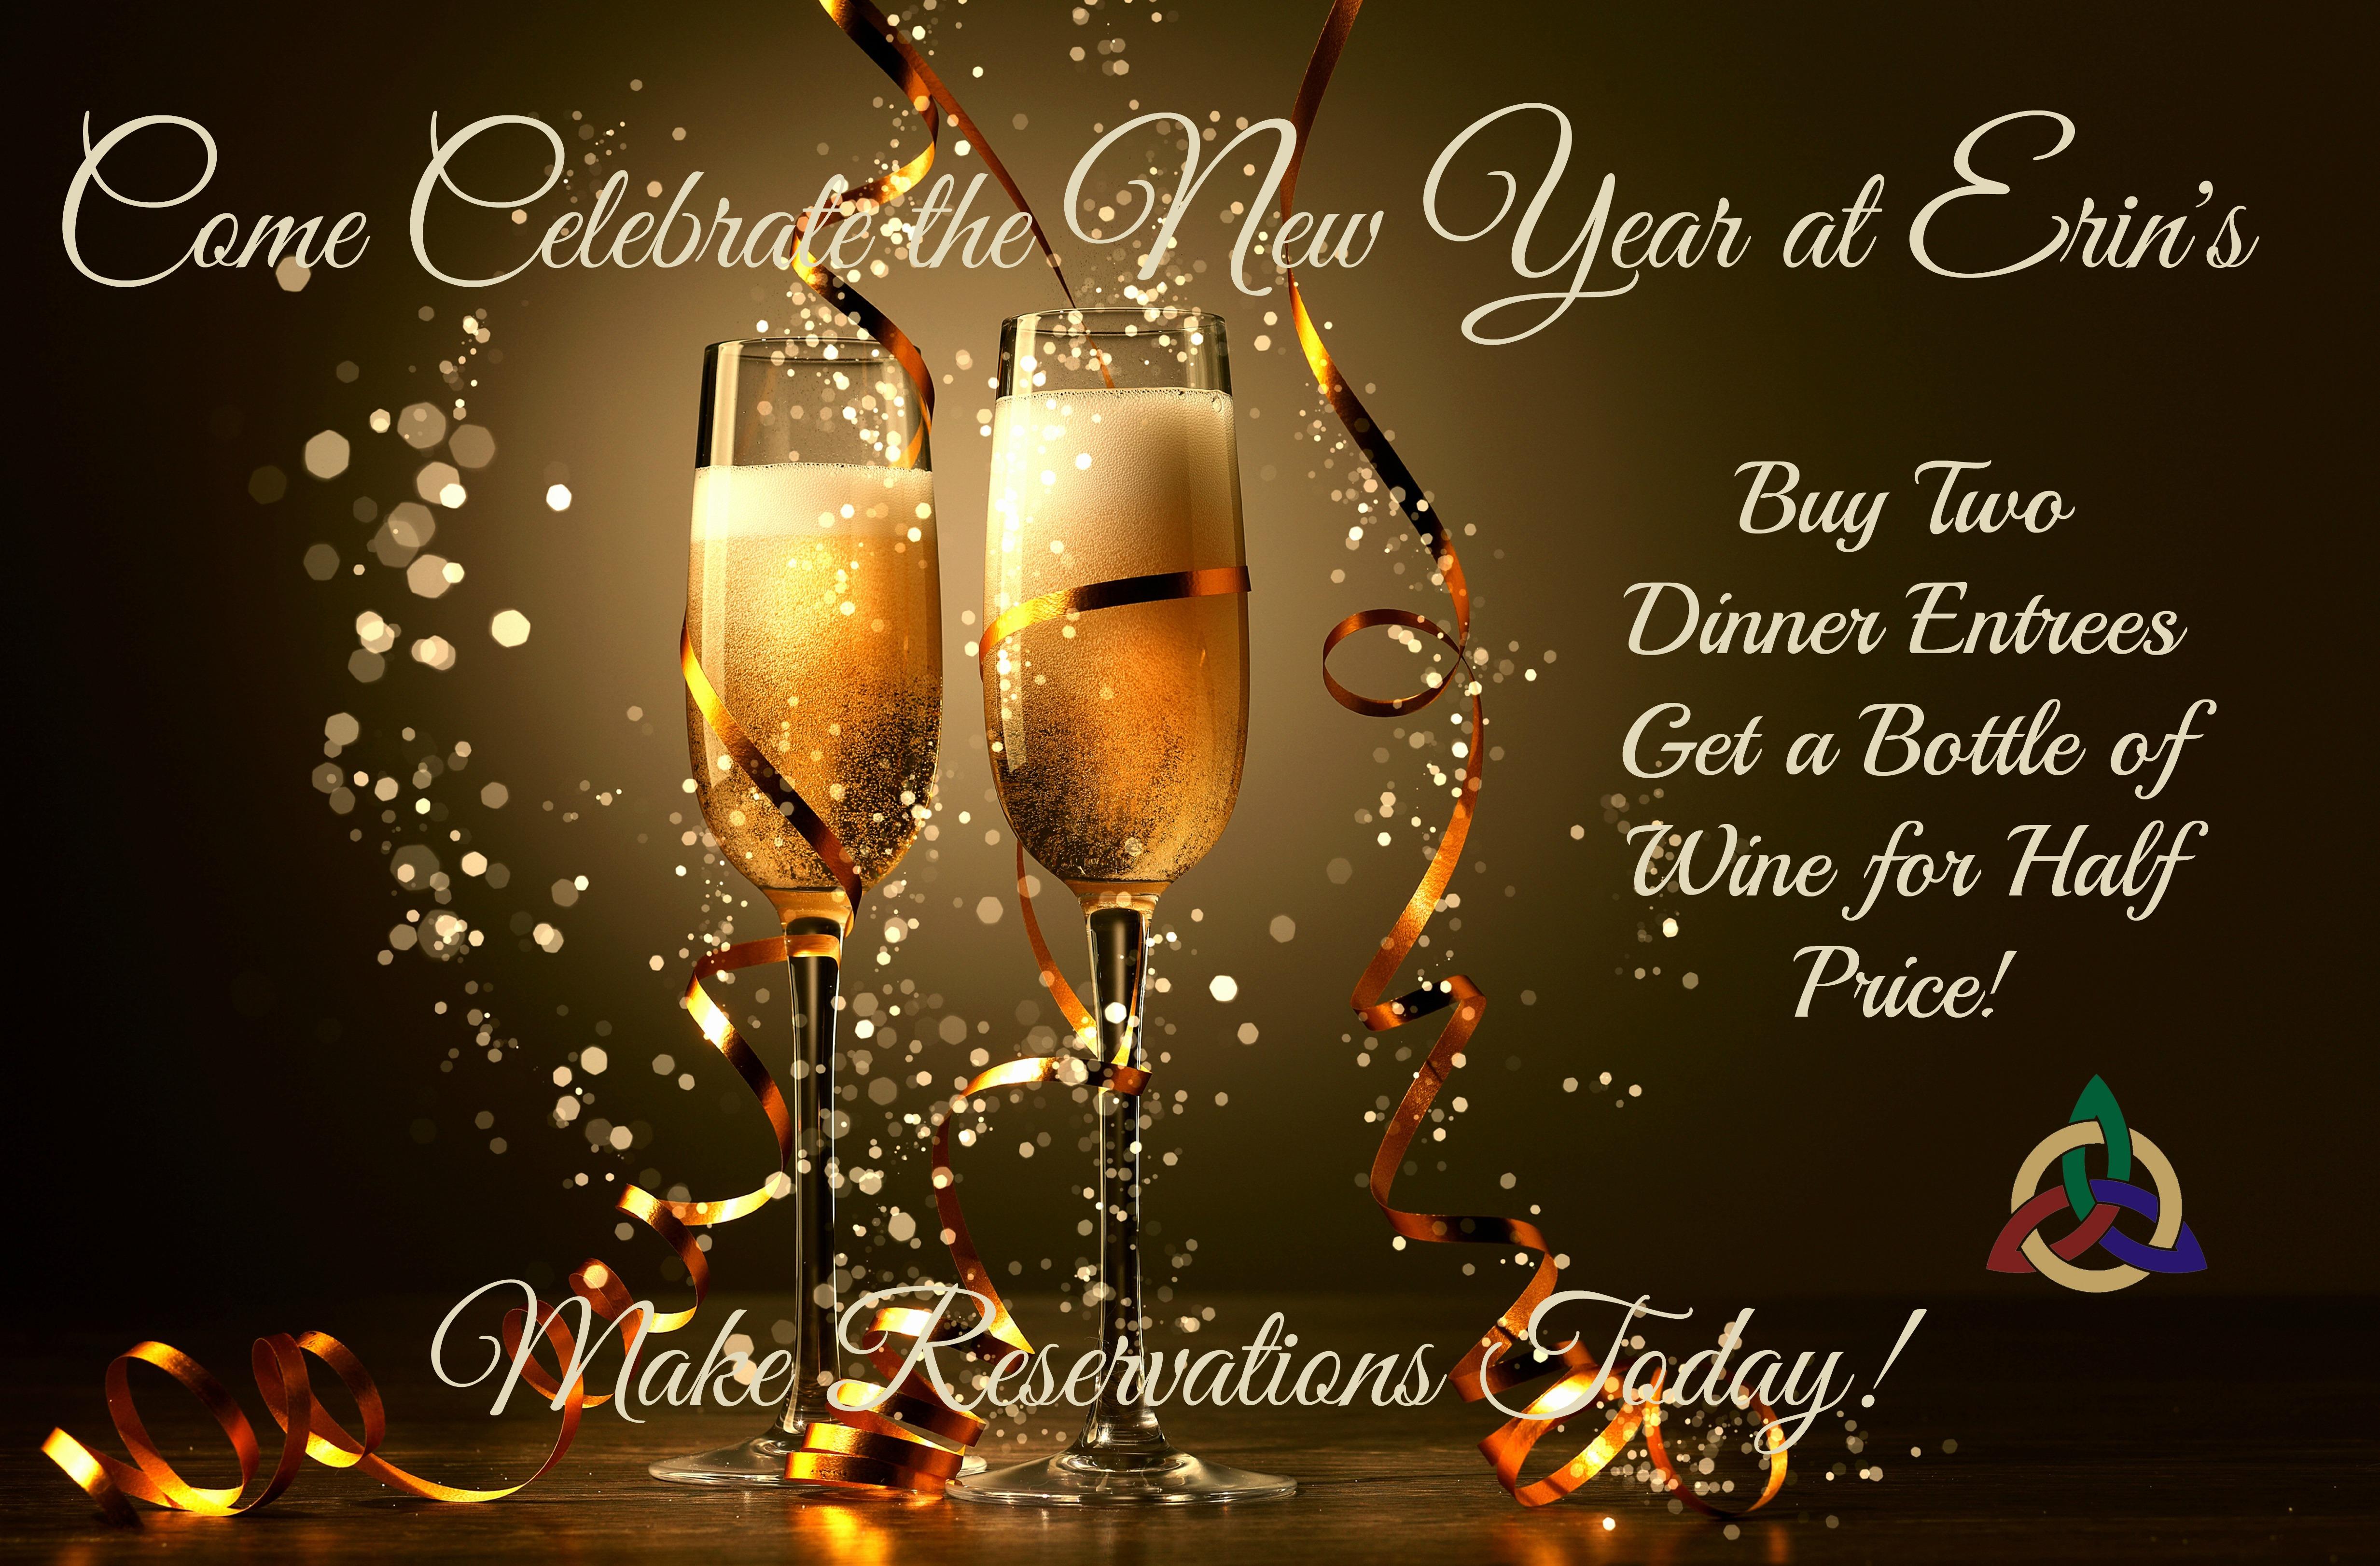 champagneglassesnew-year.jpg